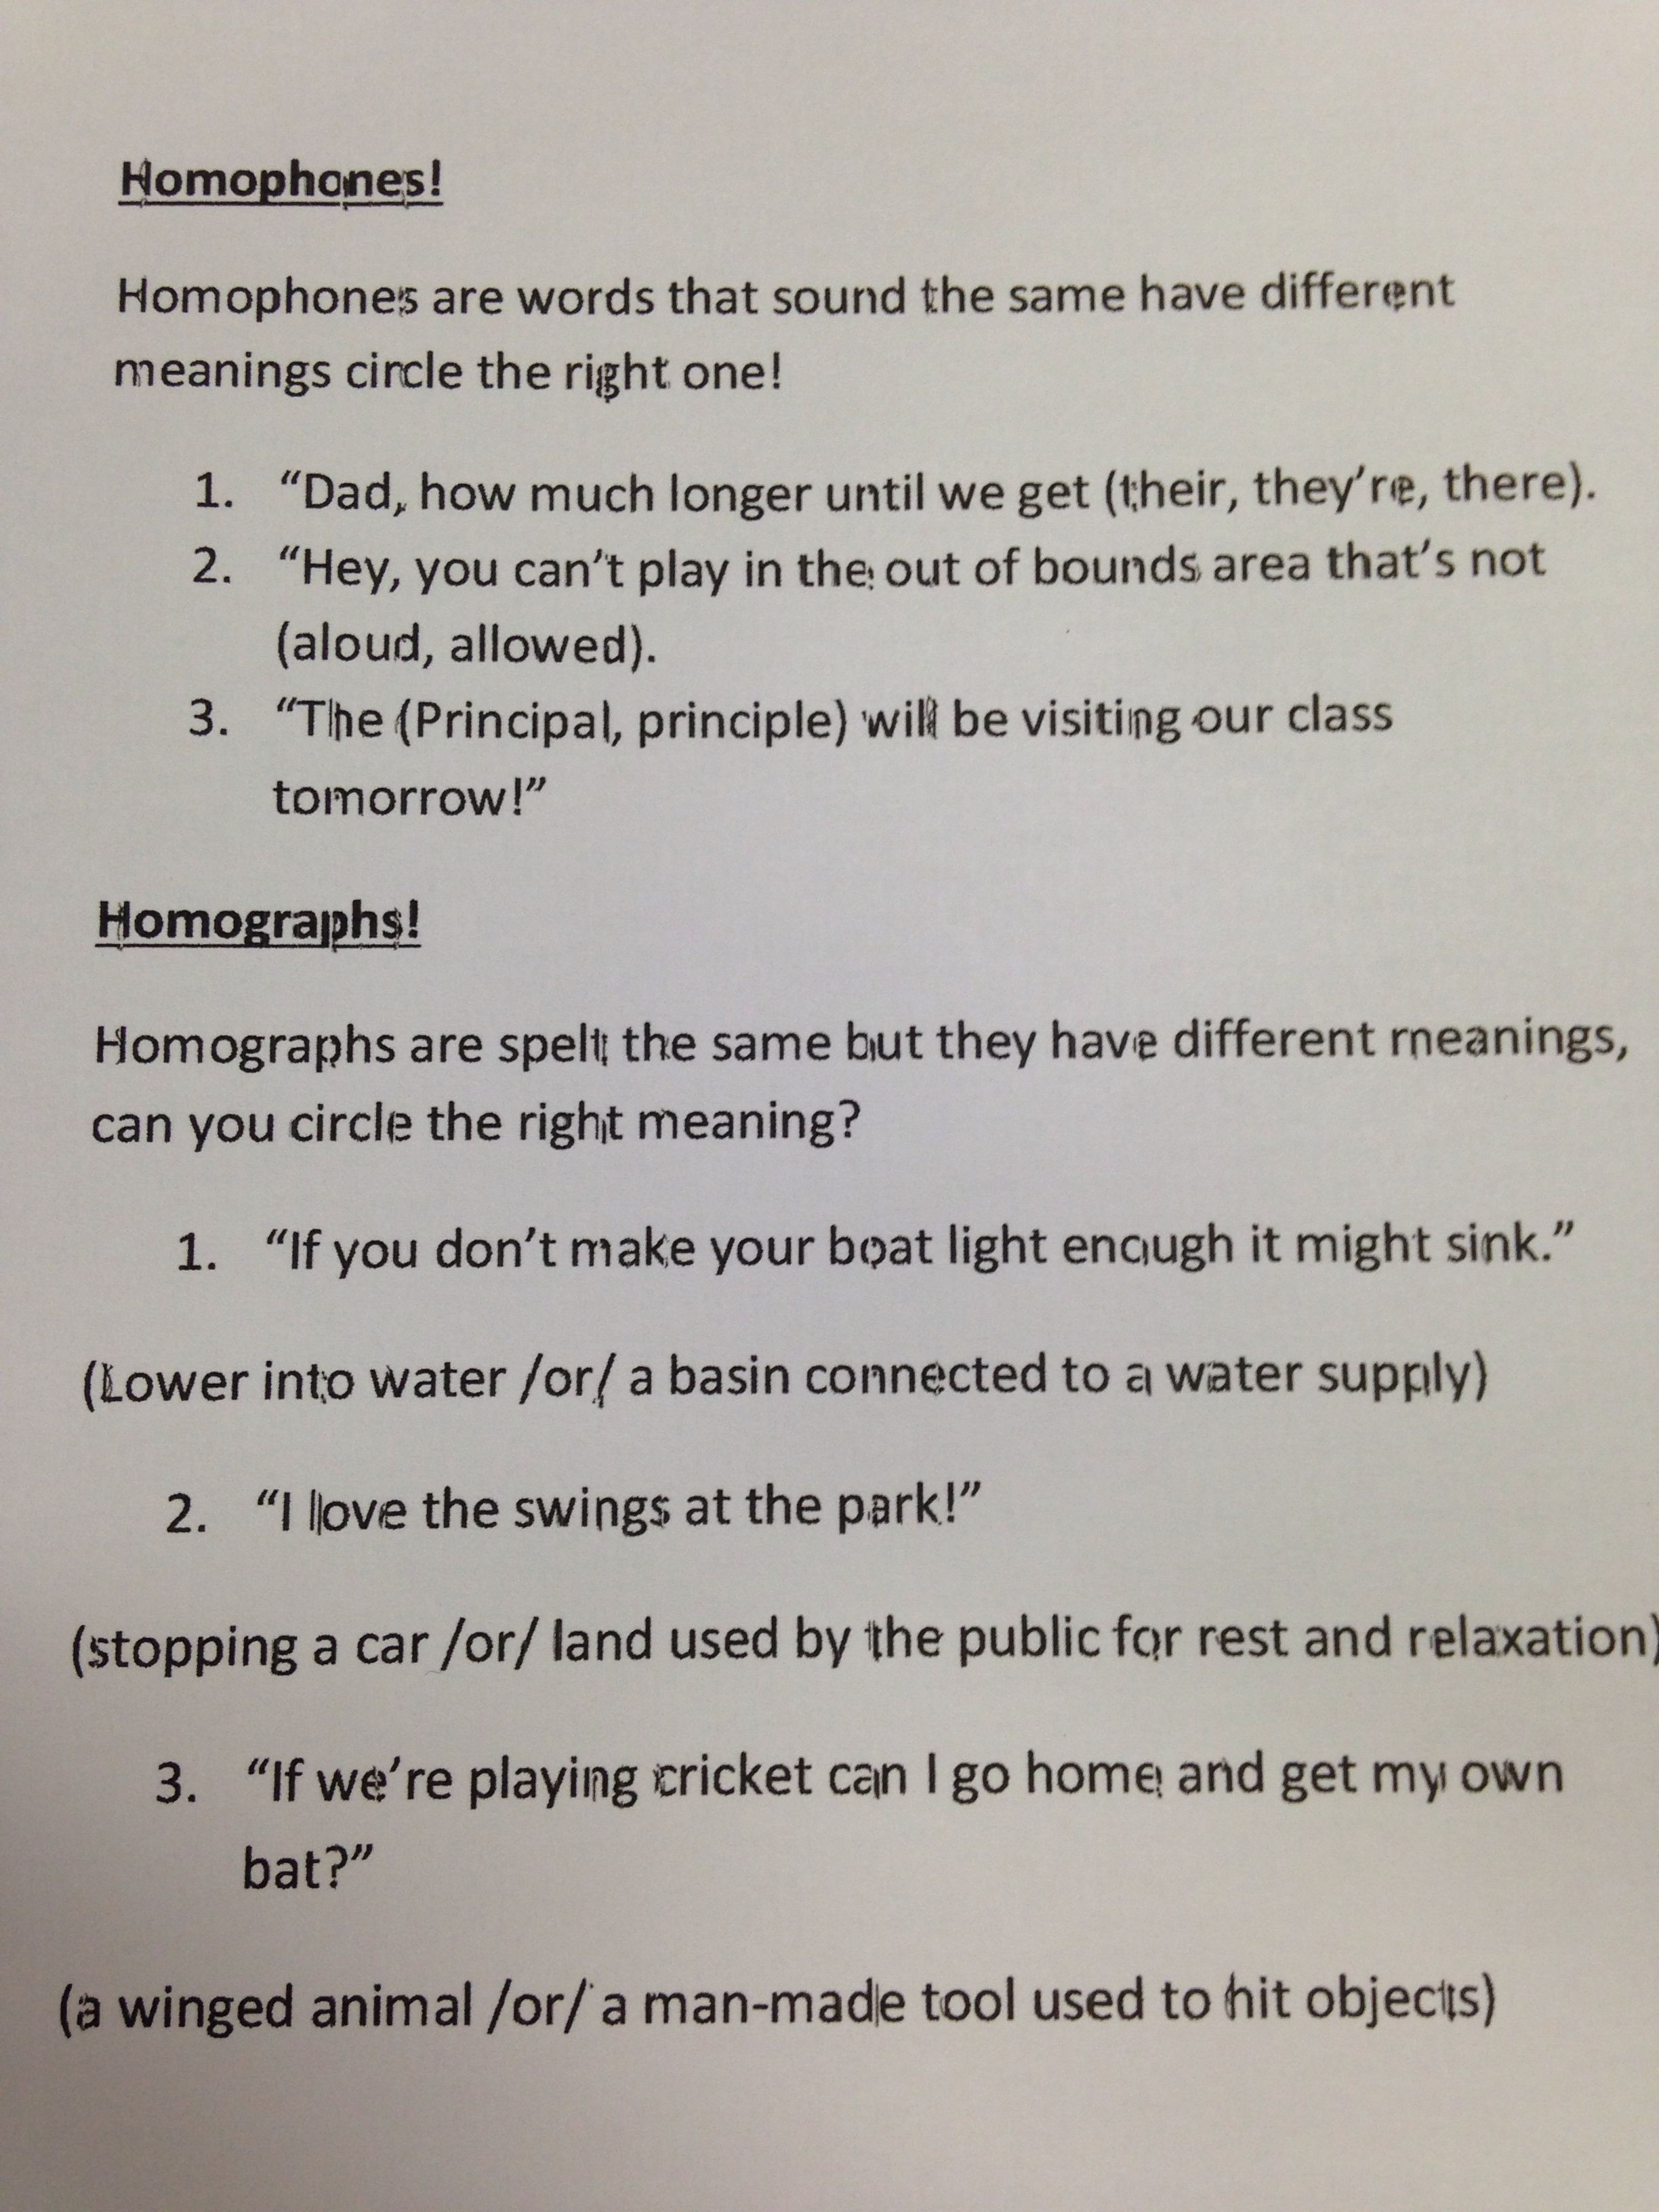 Homophones And Homographs Worksheet Activity